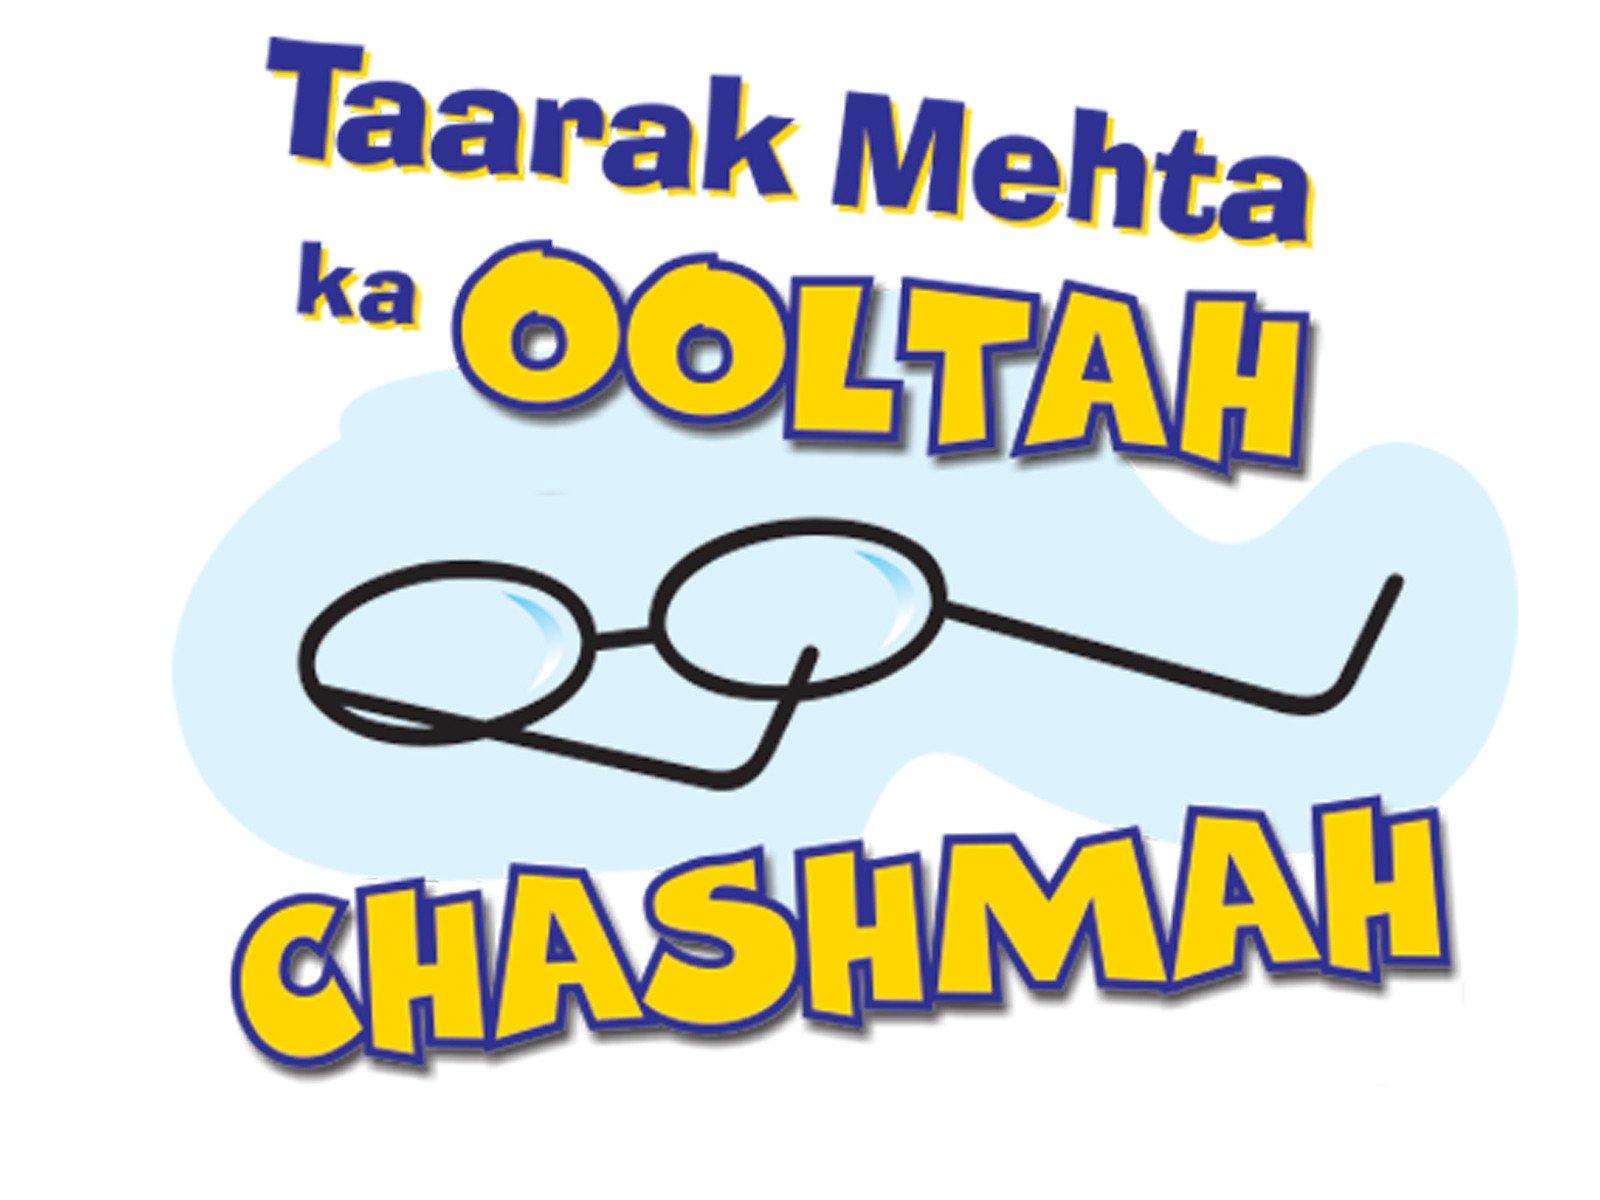 Taarak Mehta Ka Ooltah Chashmah - Season 1